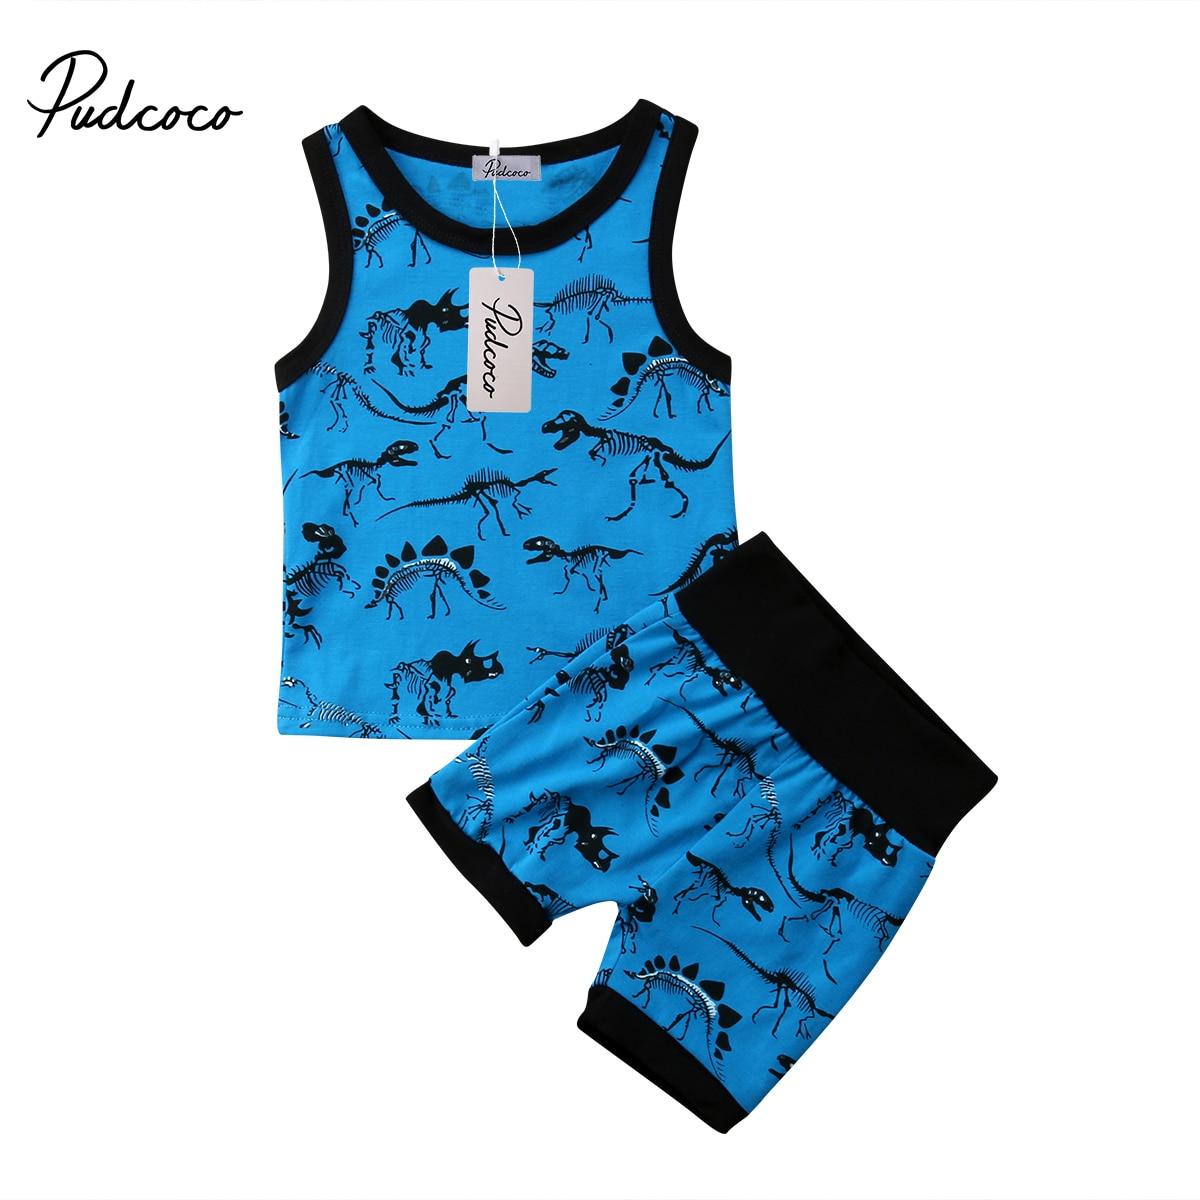 2Pcs Toddler Baby Boy Clothes Kid Cotton Cartoon Dinosaur Vest Top+Short Pants Outfit Summer Children Clothing Set  0-24M